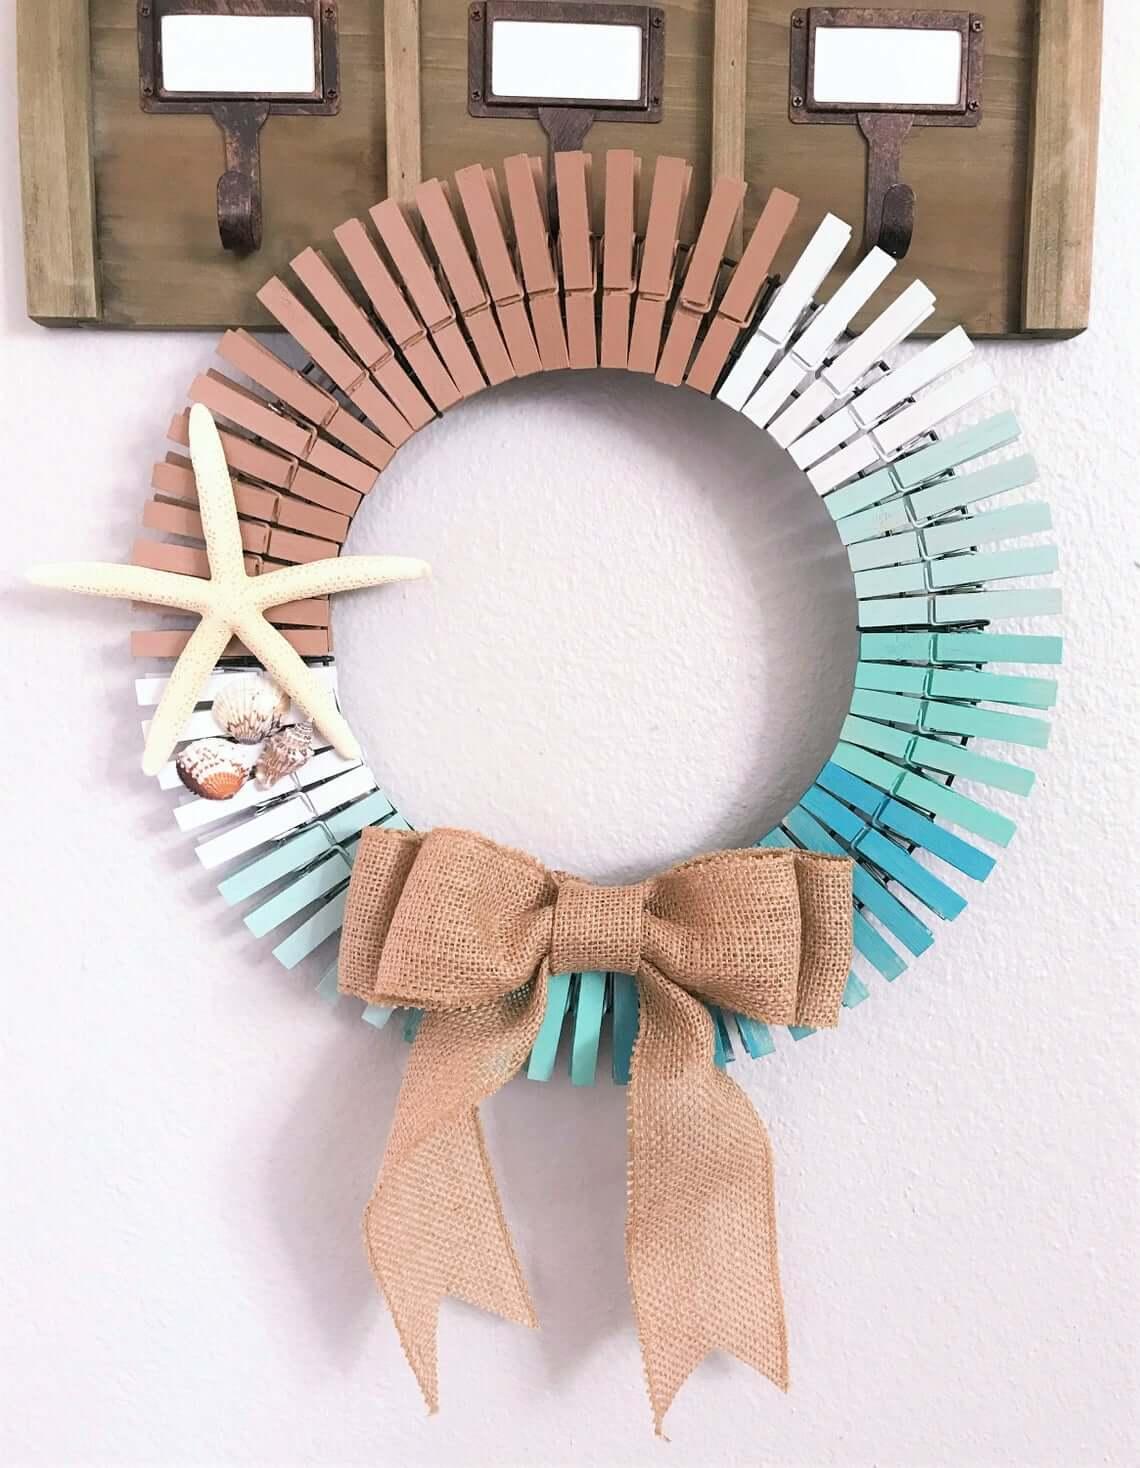 Sand and Sea Beach Themed Clothespin Wreath